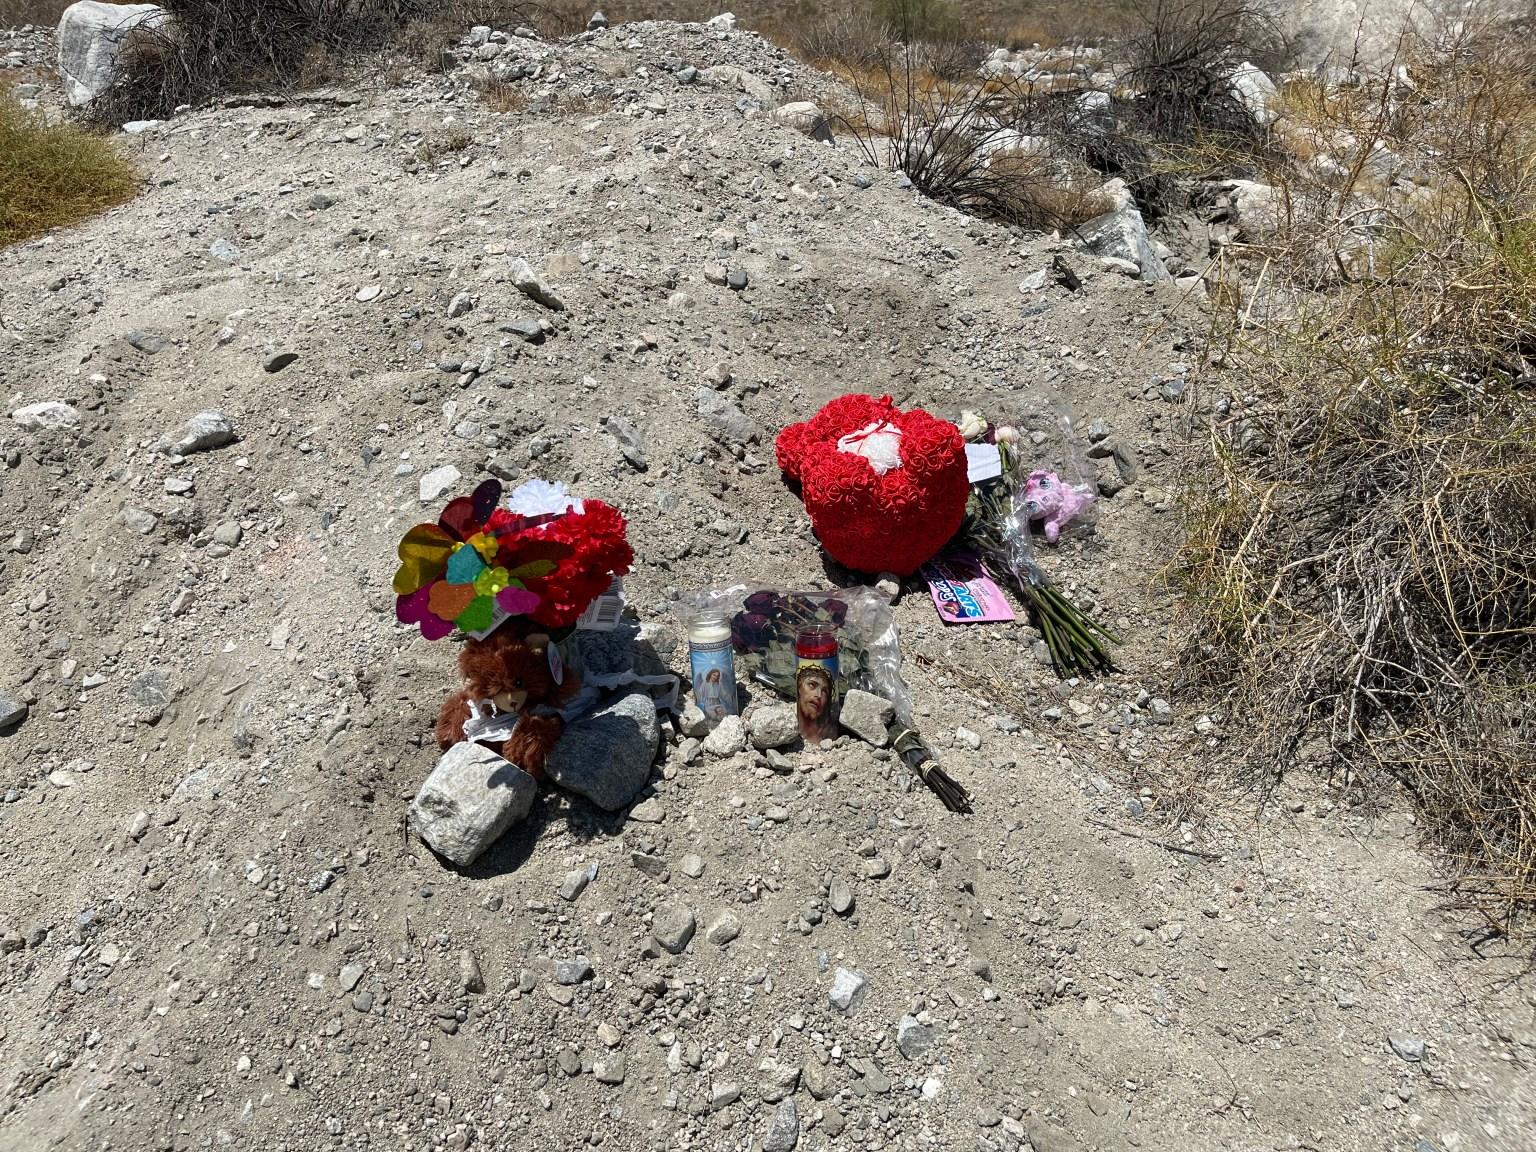 Two Teenage Girls Die, One Suffers Major Injuries in DUI Crash Near Indio